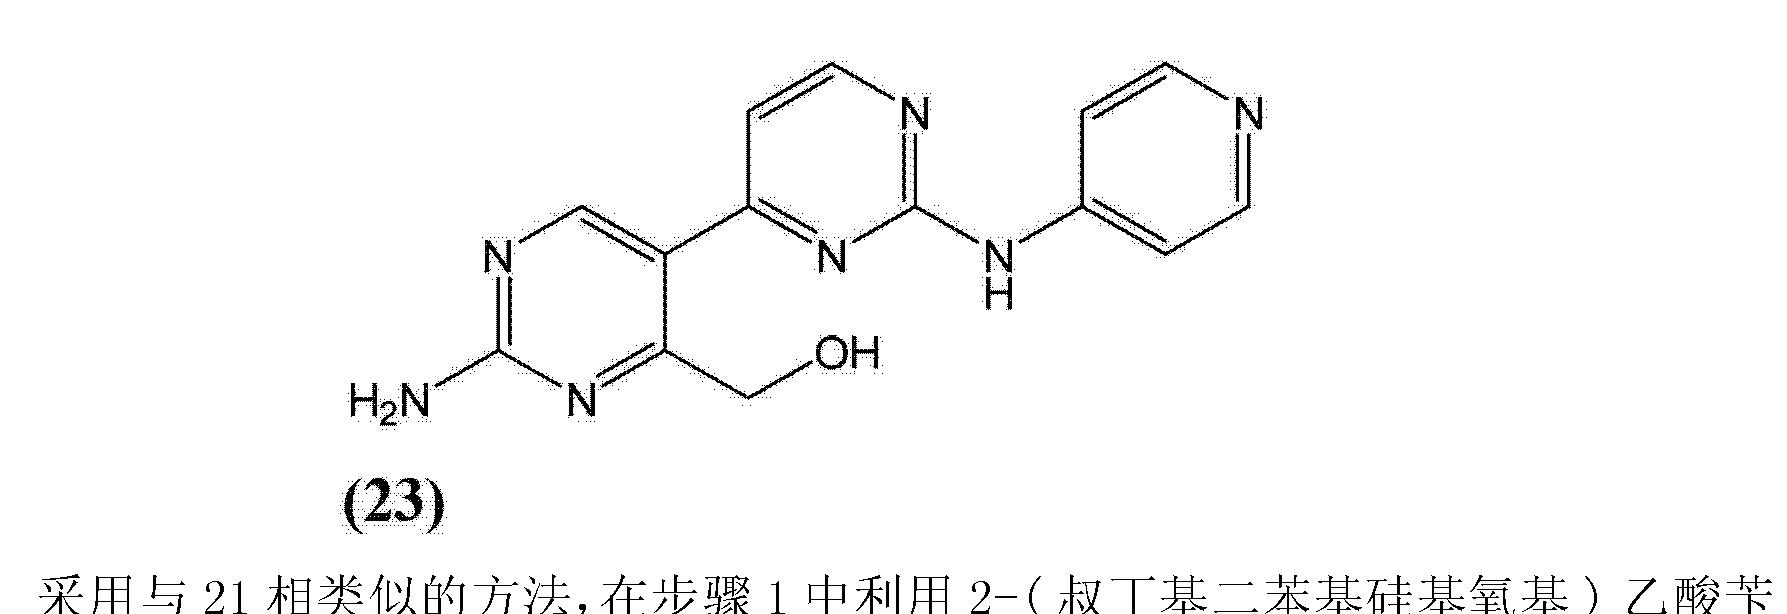 Figure CN103270026AD00761